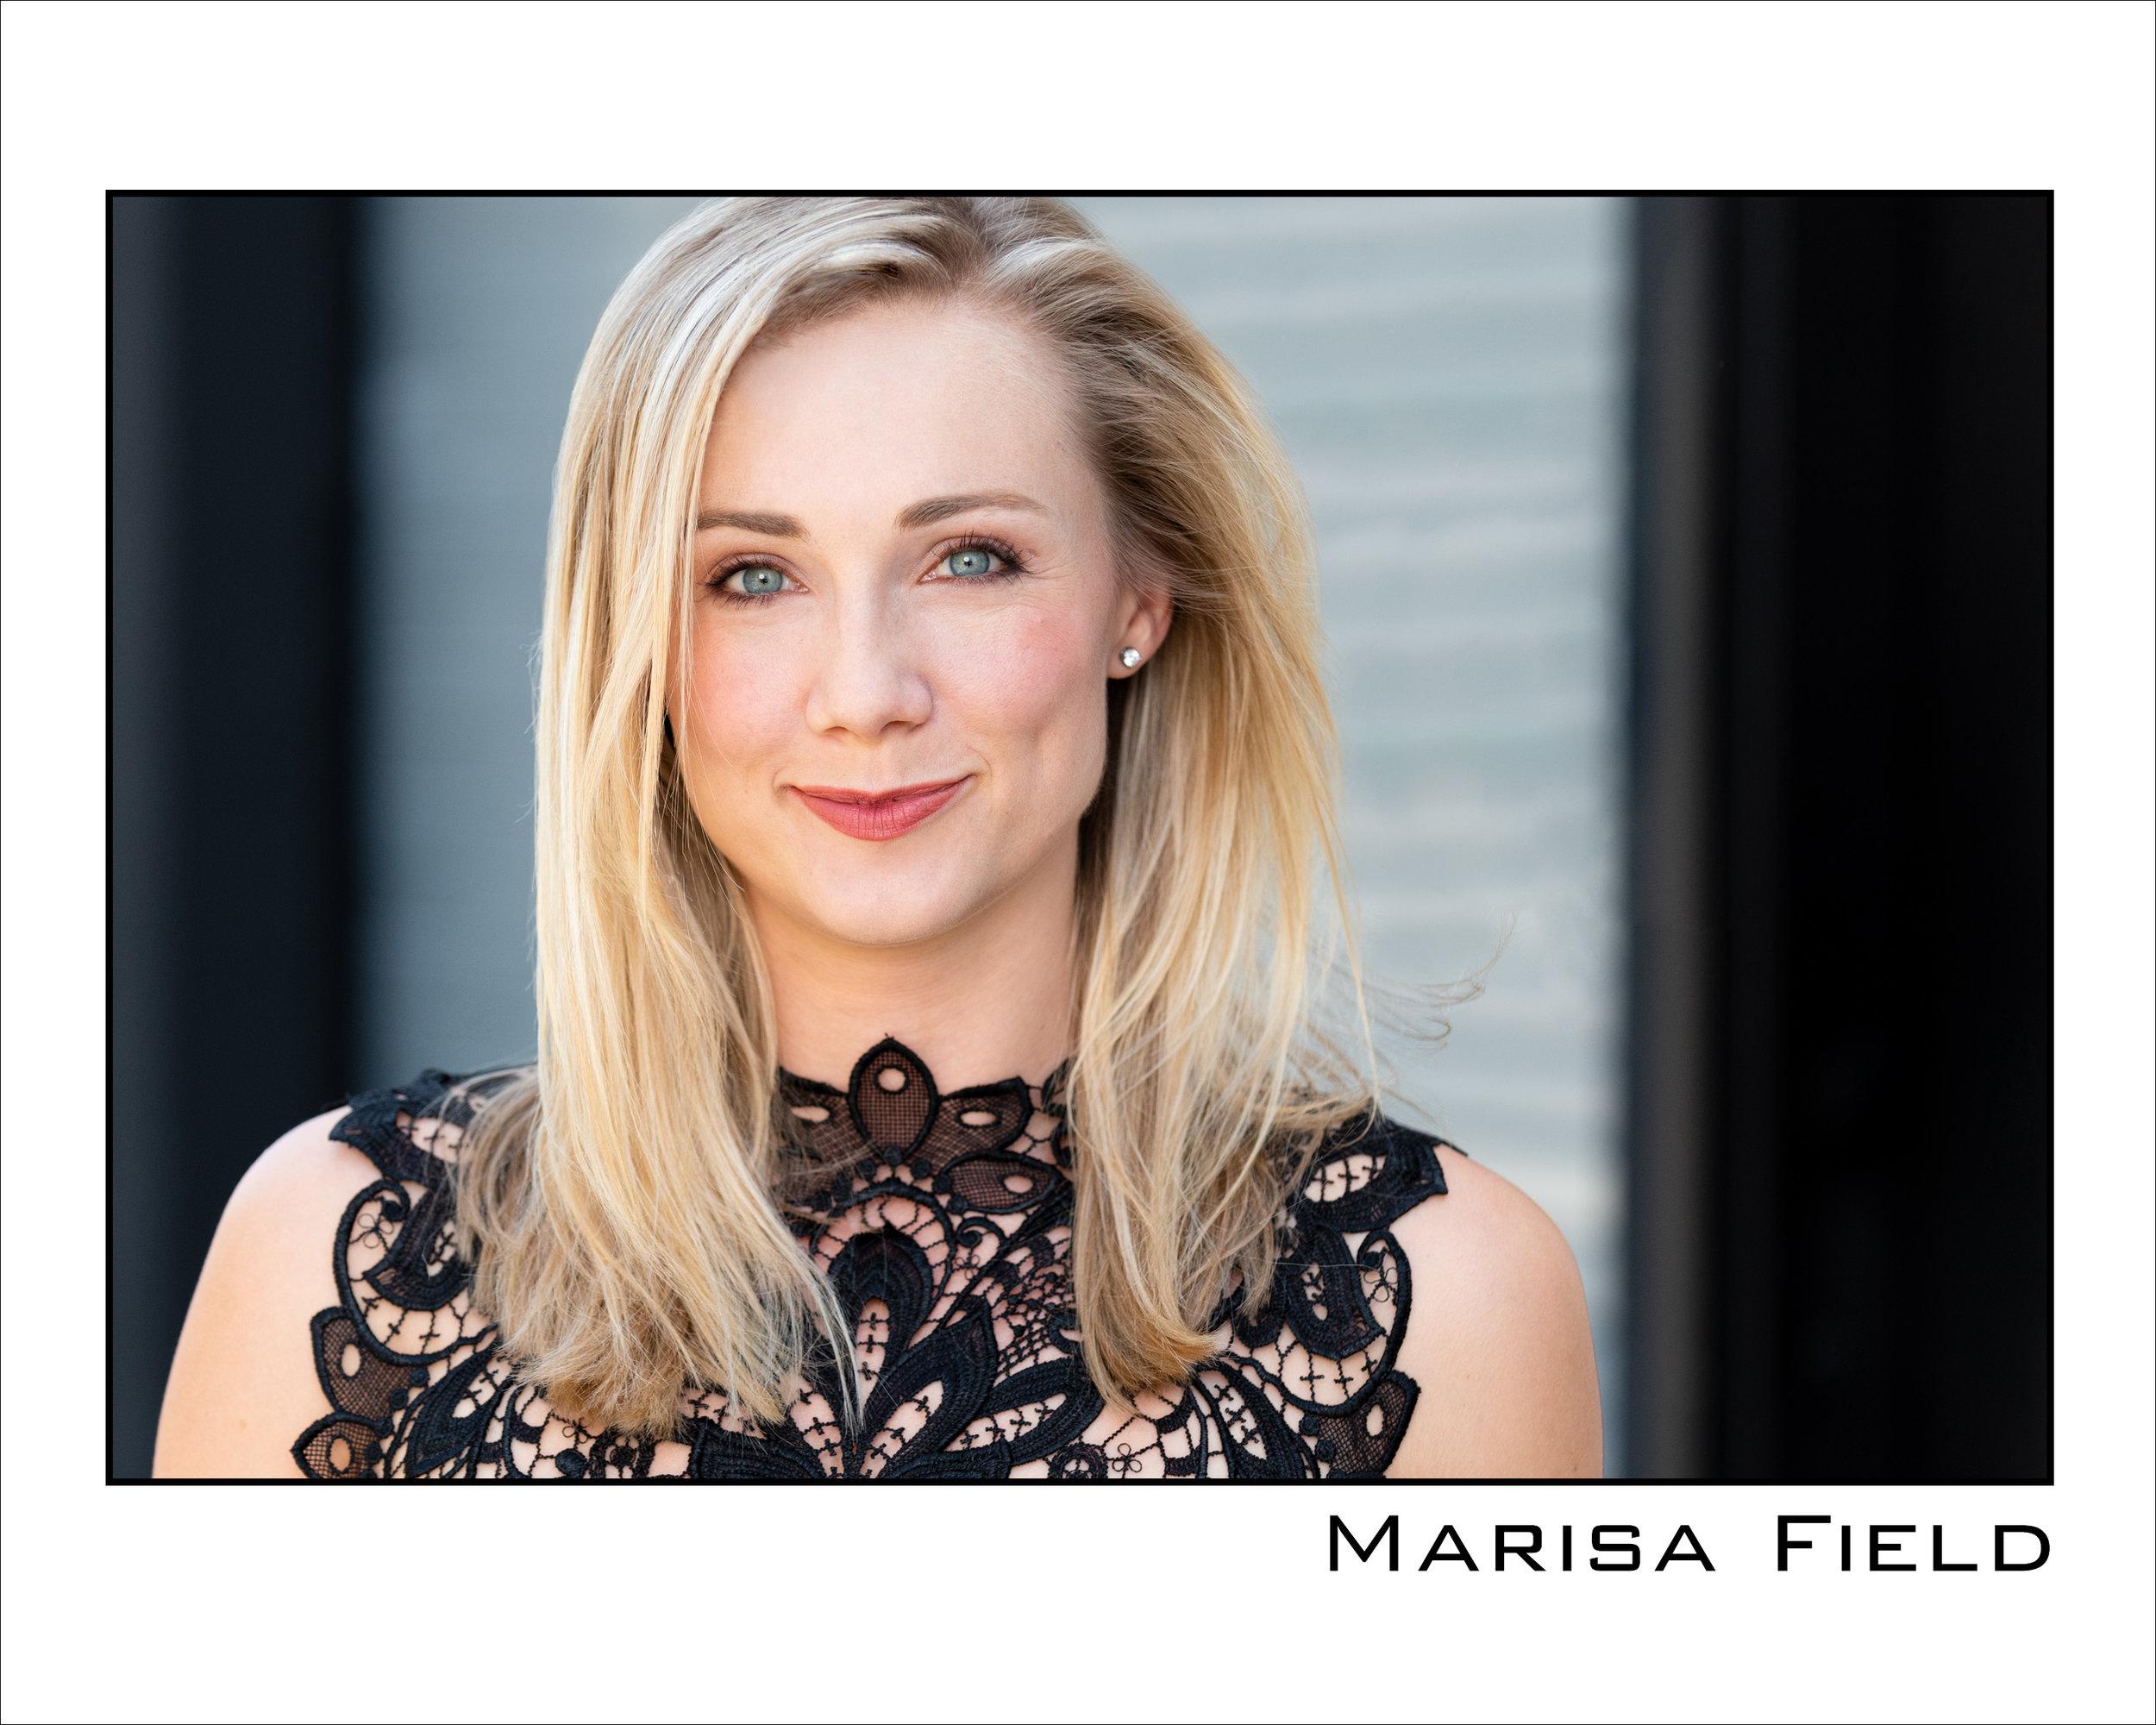 Marisa Field HS